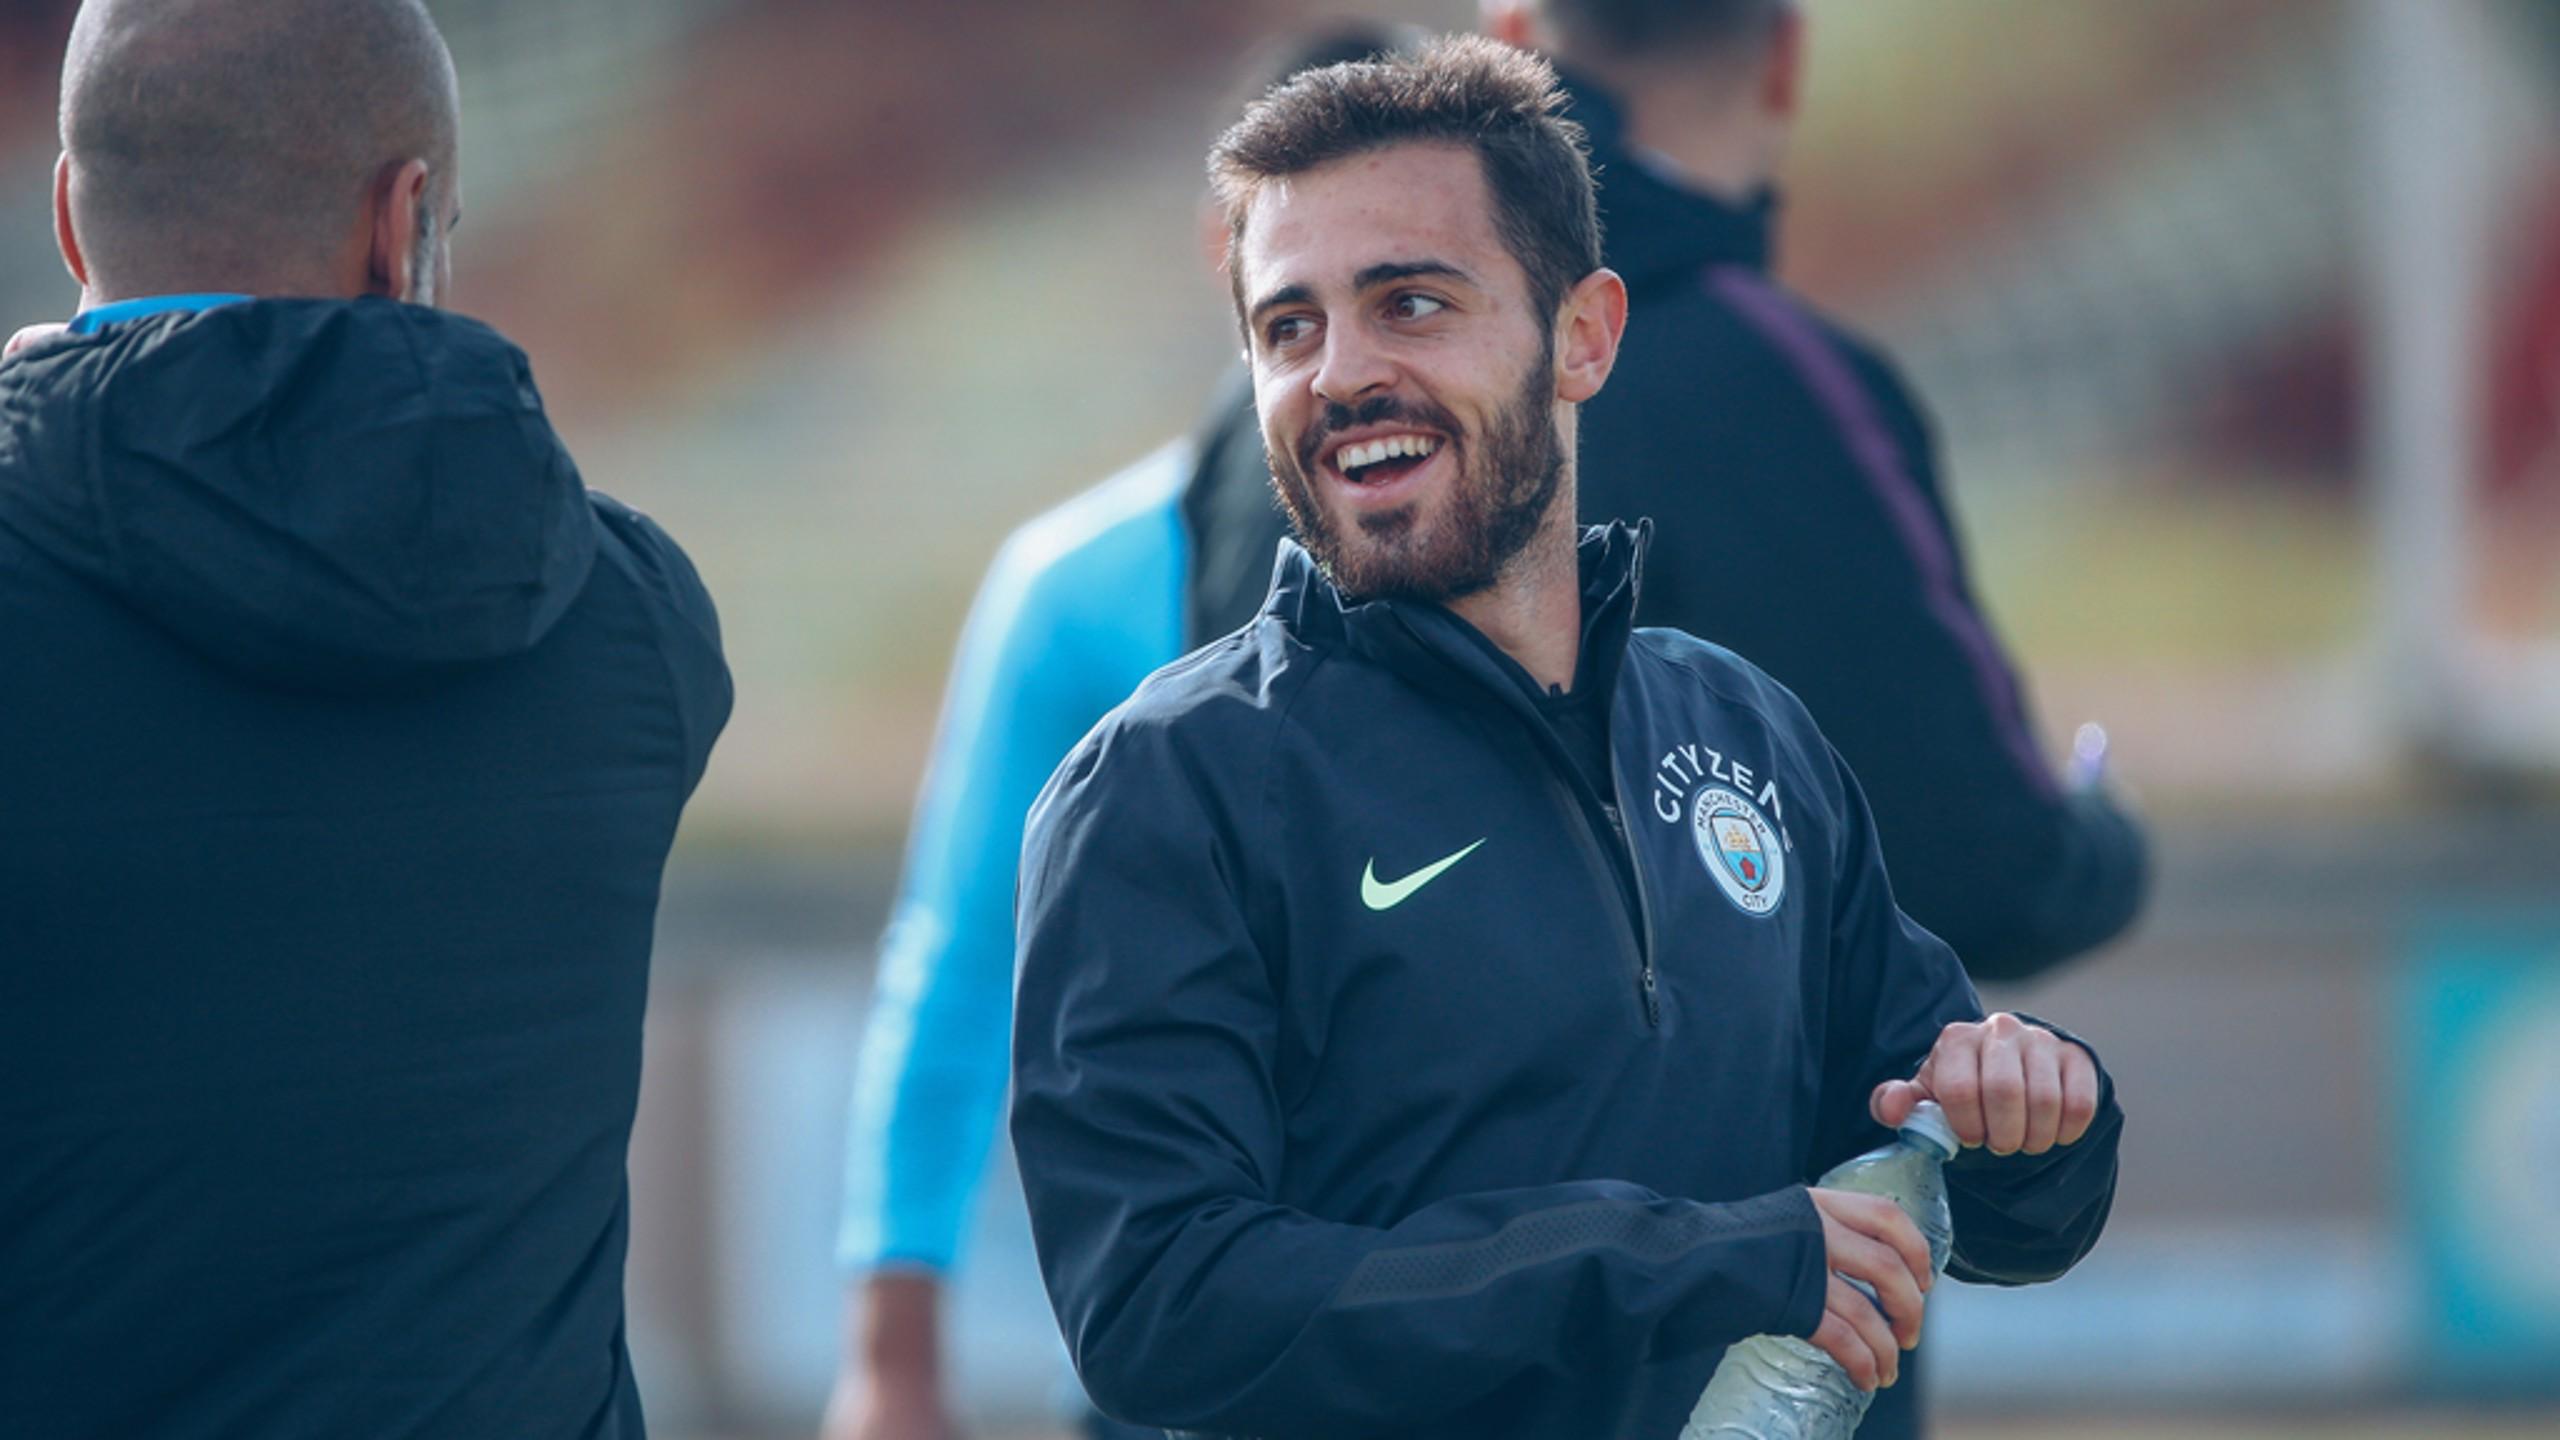 WORTH HIS WEIGHT IN SILVA: Bernardo Silva had an impactful cameo from the bench